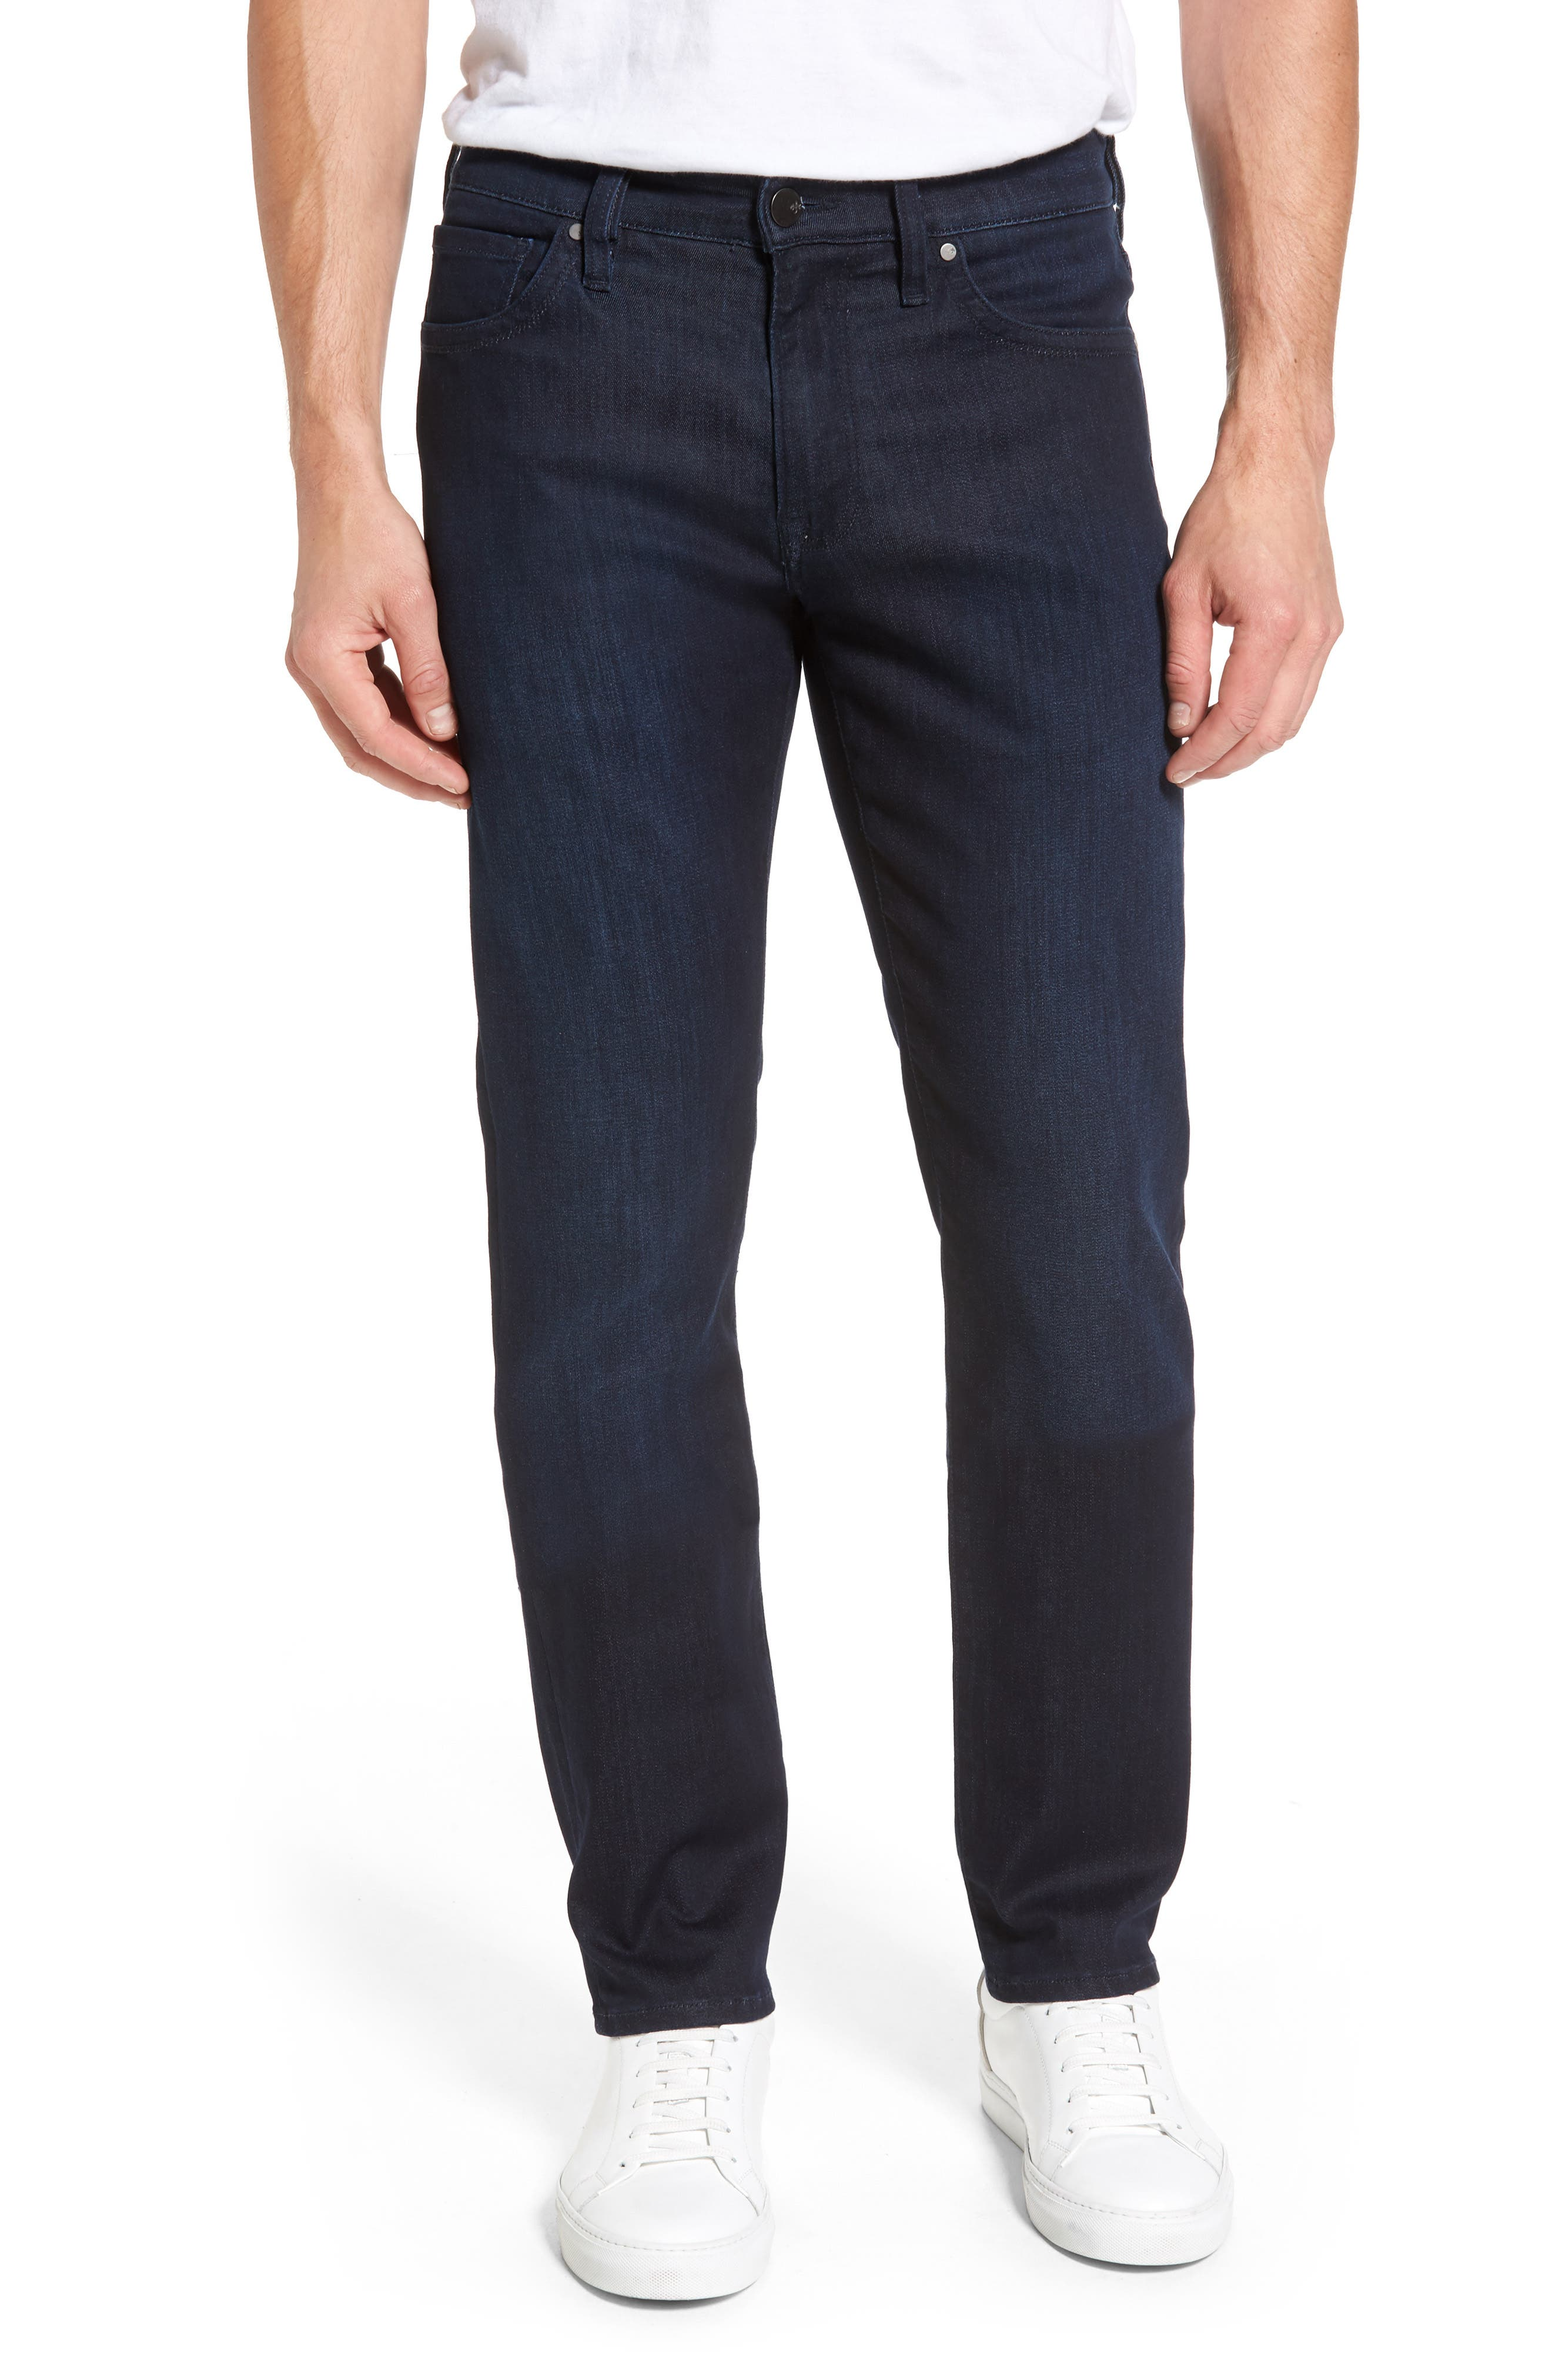 34 Heritage Courage Straight Leg Jeans (Dark Rome)